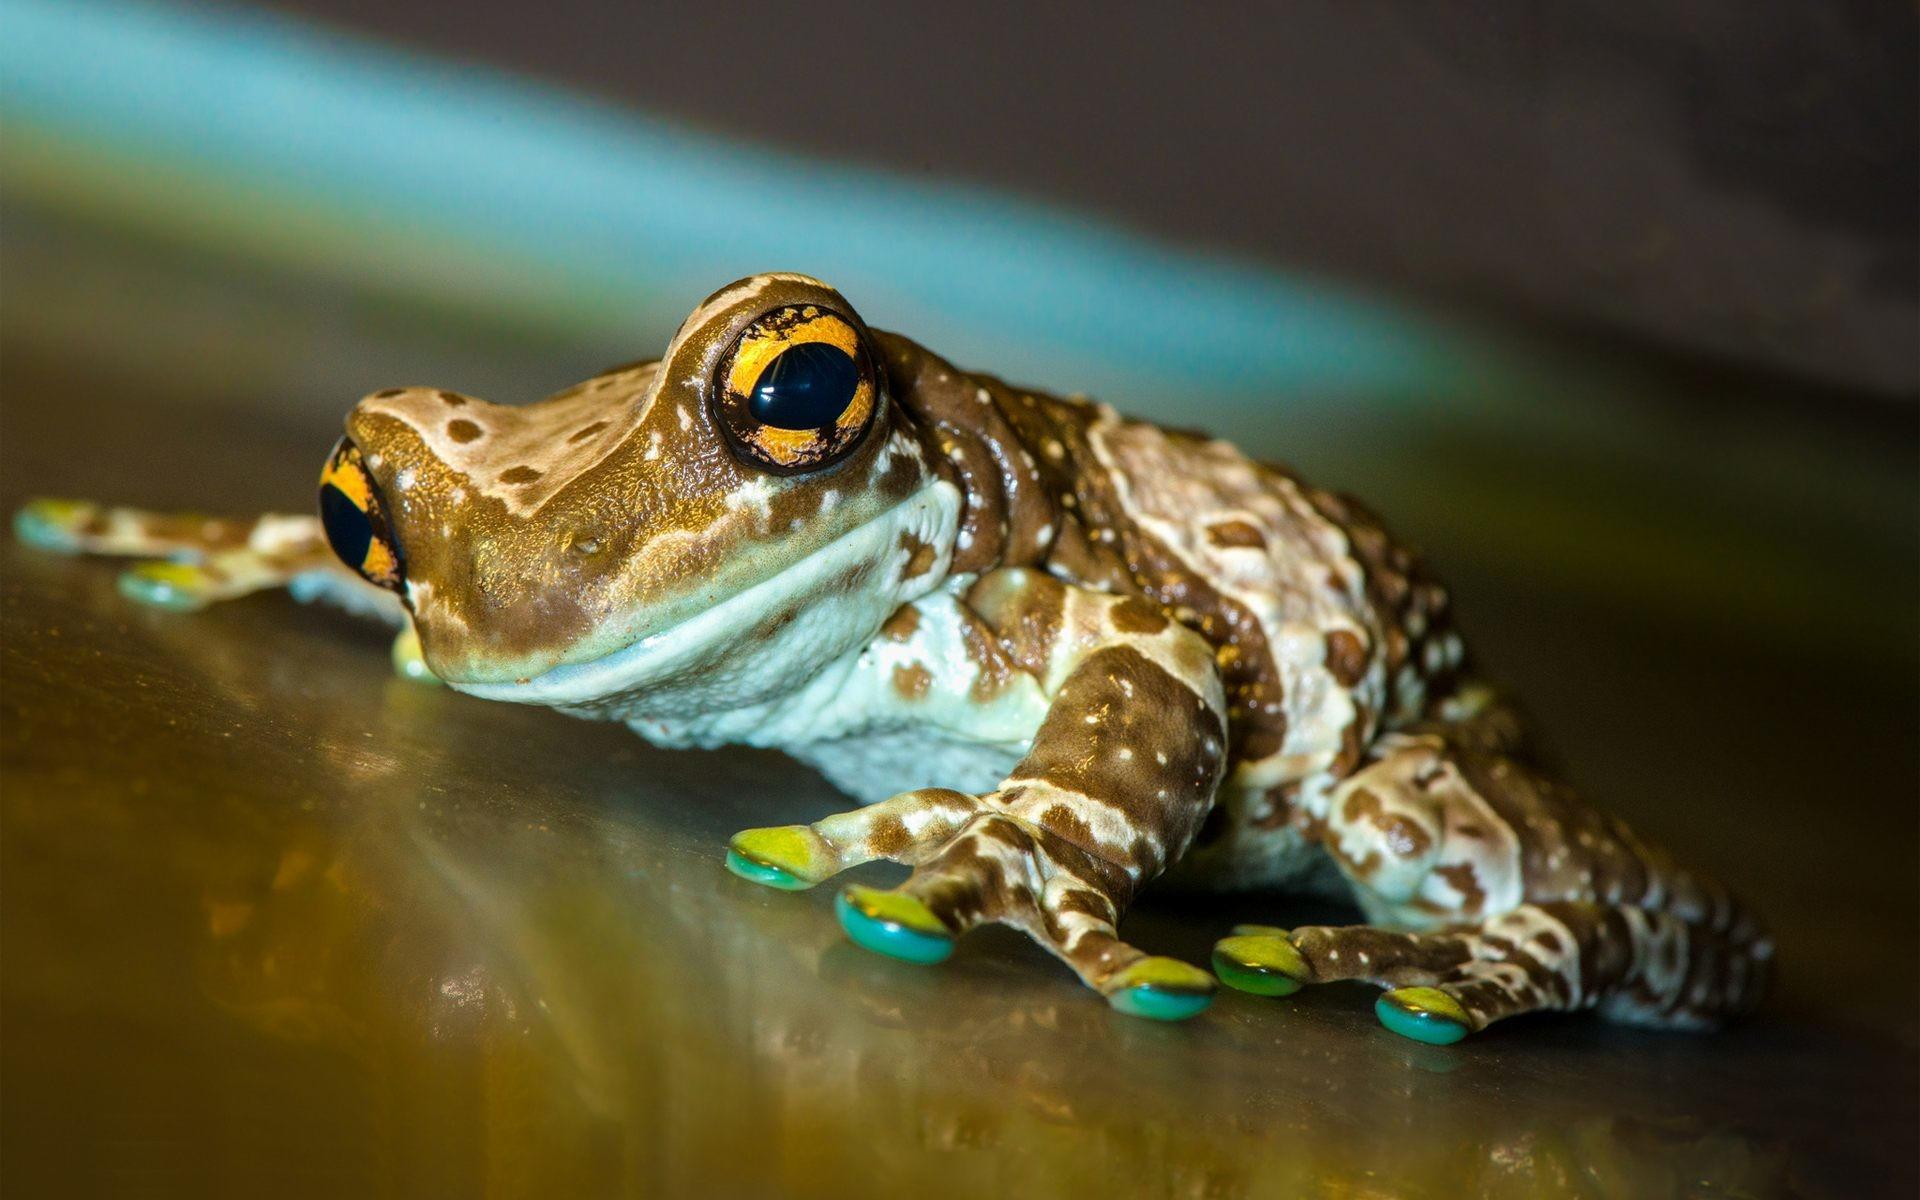 Cute Frog Wallpaper Wide